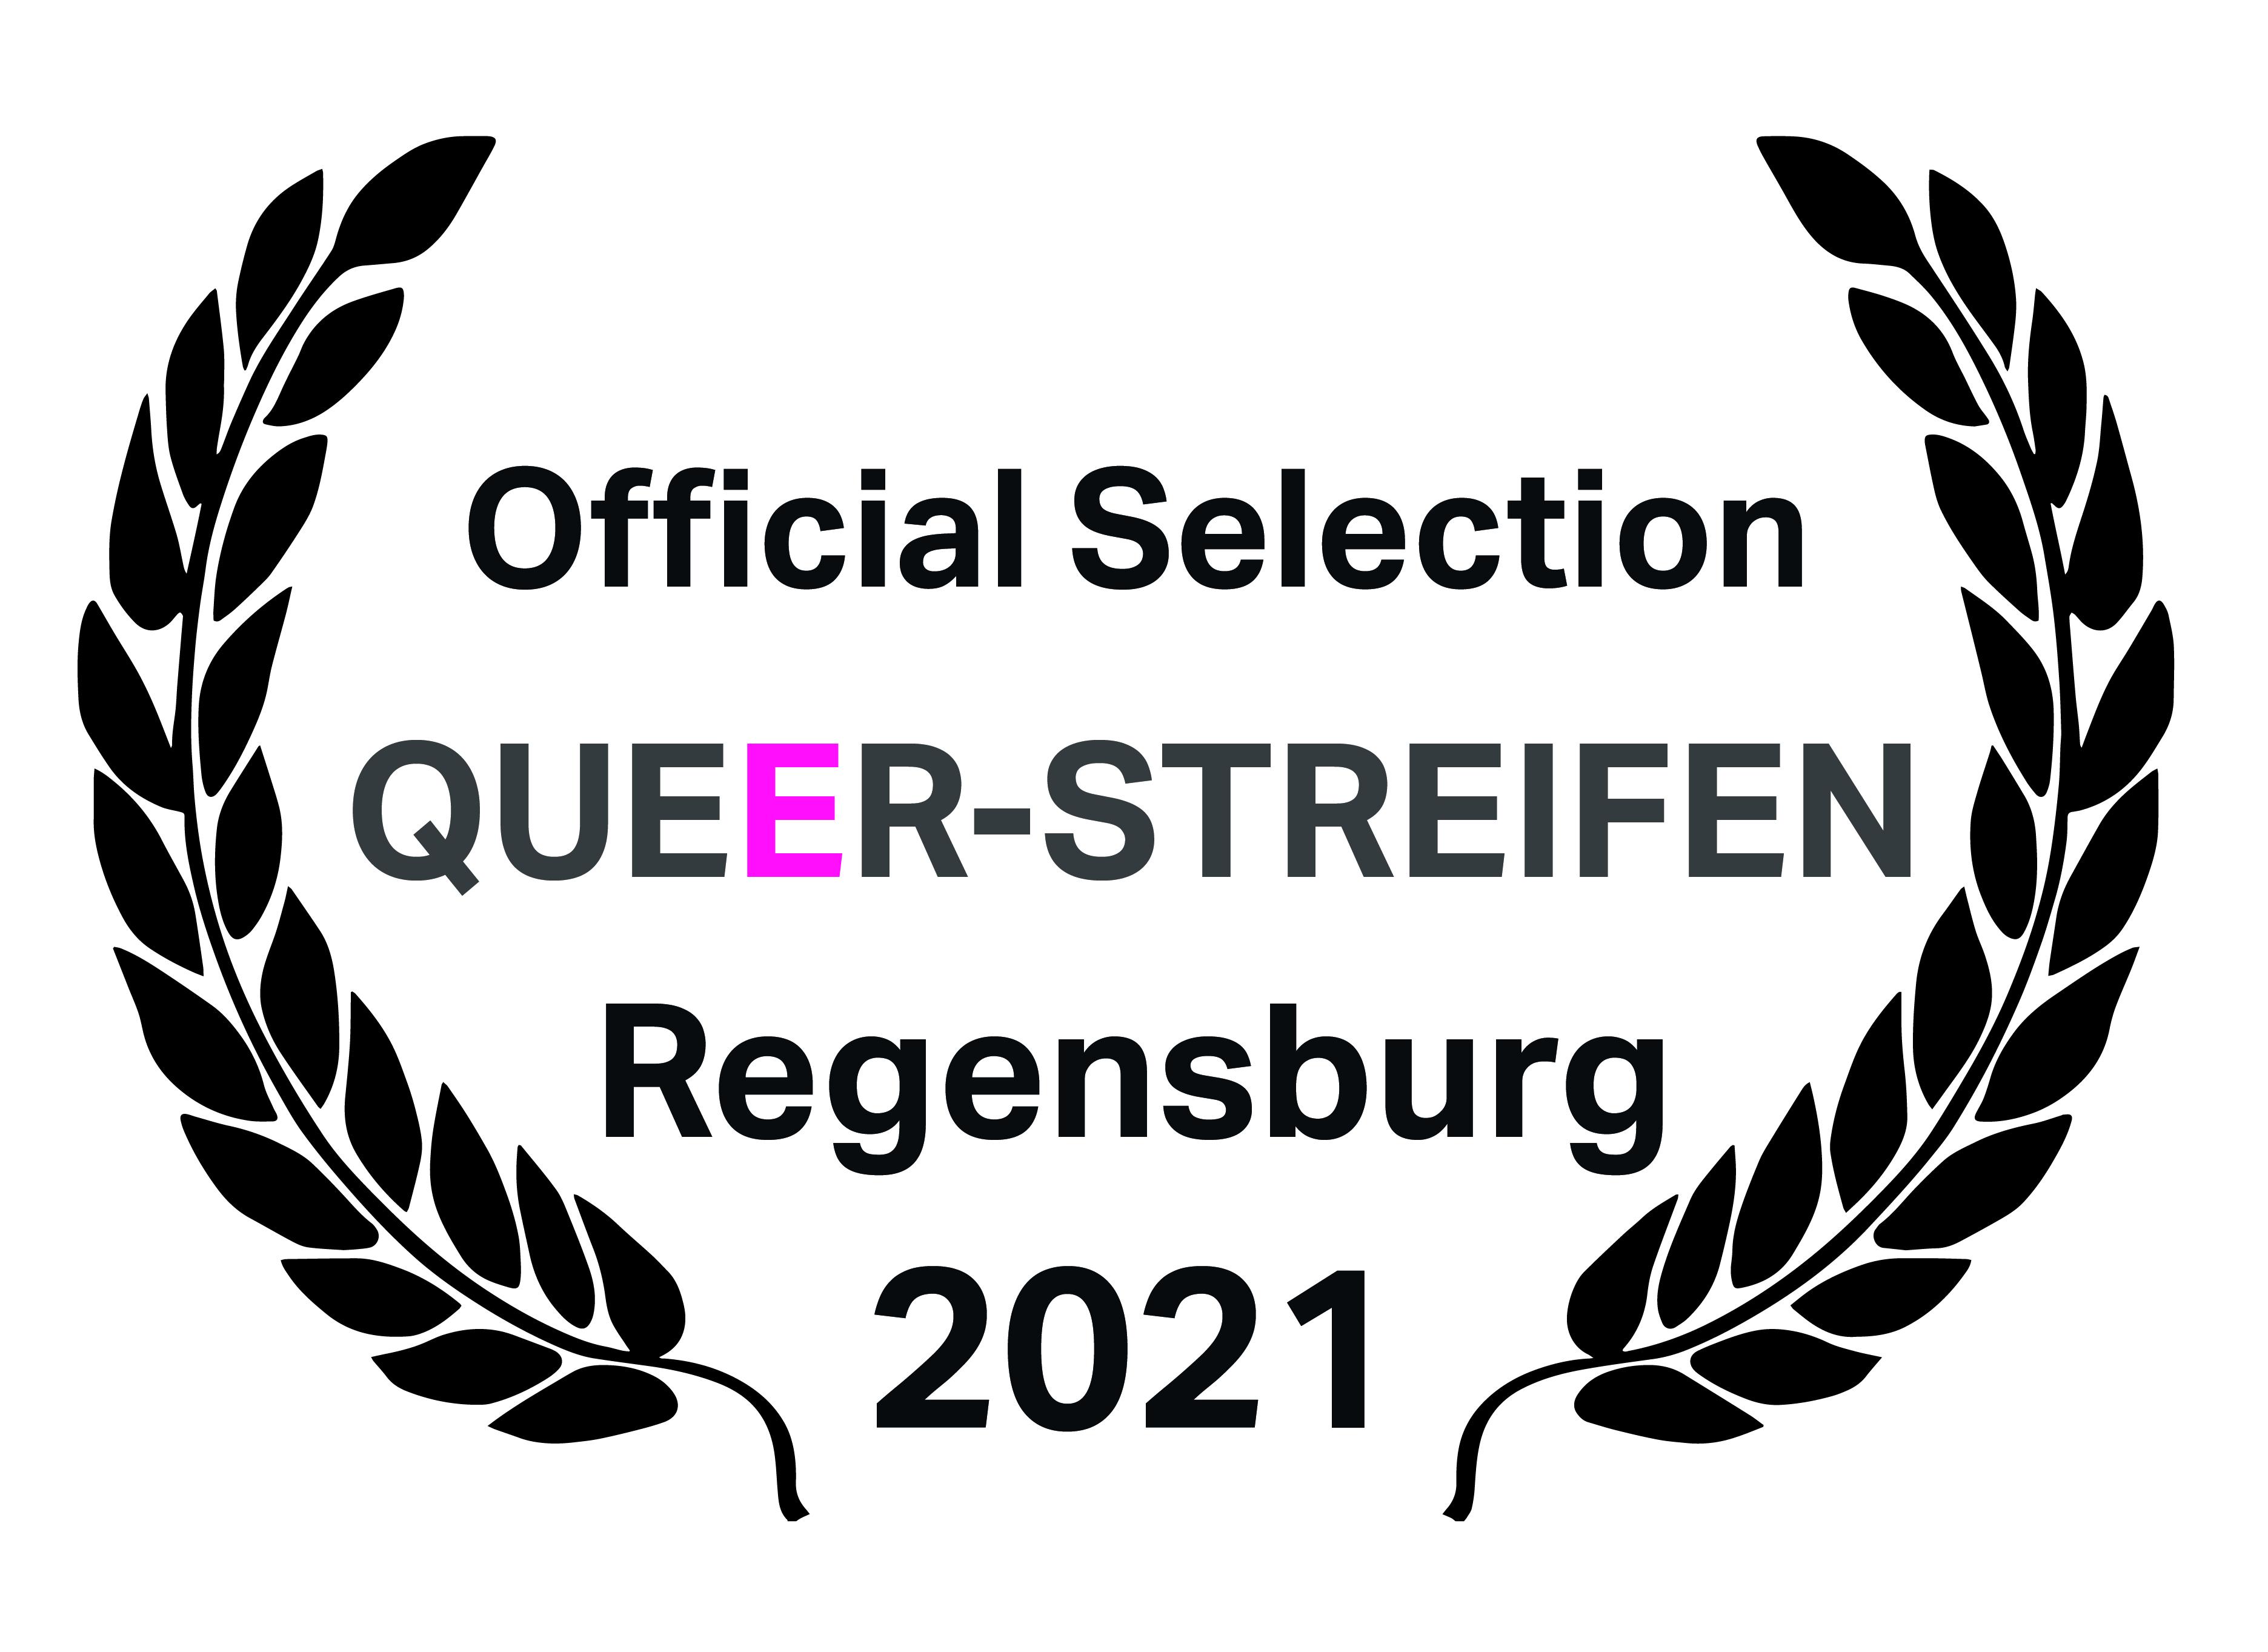 Queer-Streifen Regensburg Film Festival